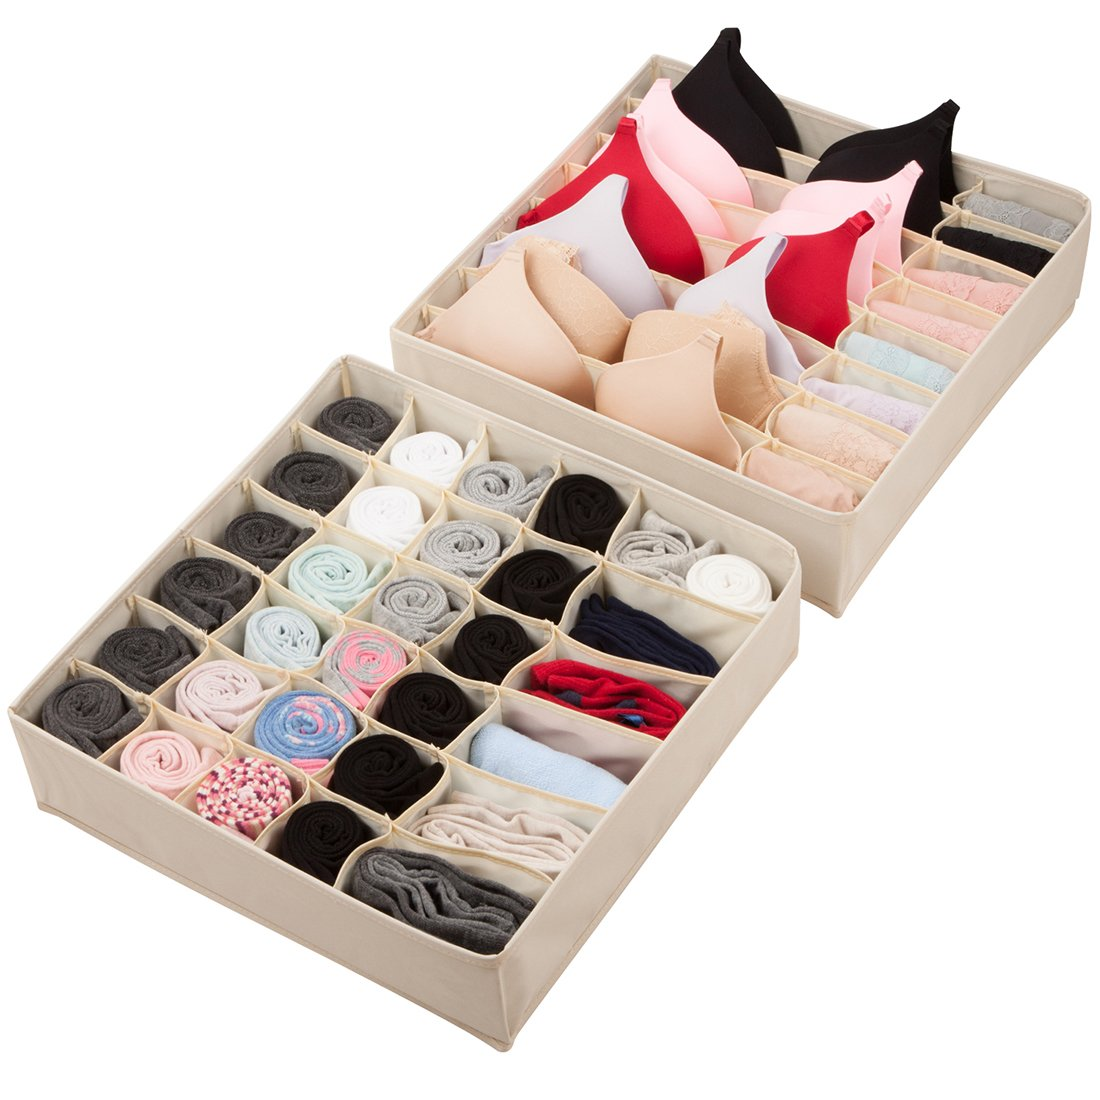 Univivi Closet Organizers Underwear Drawer Storage Box Foldable Oxford Fabric Large Size,Beige, Set of 2